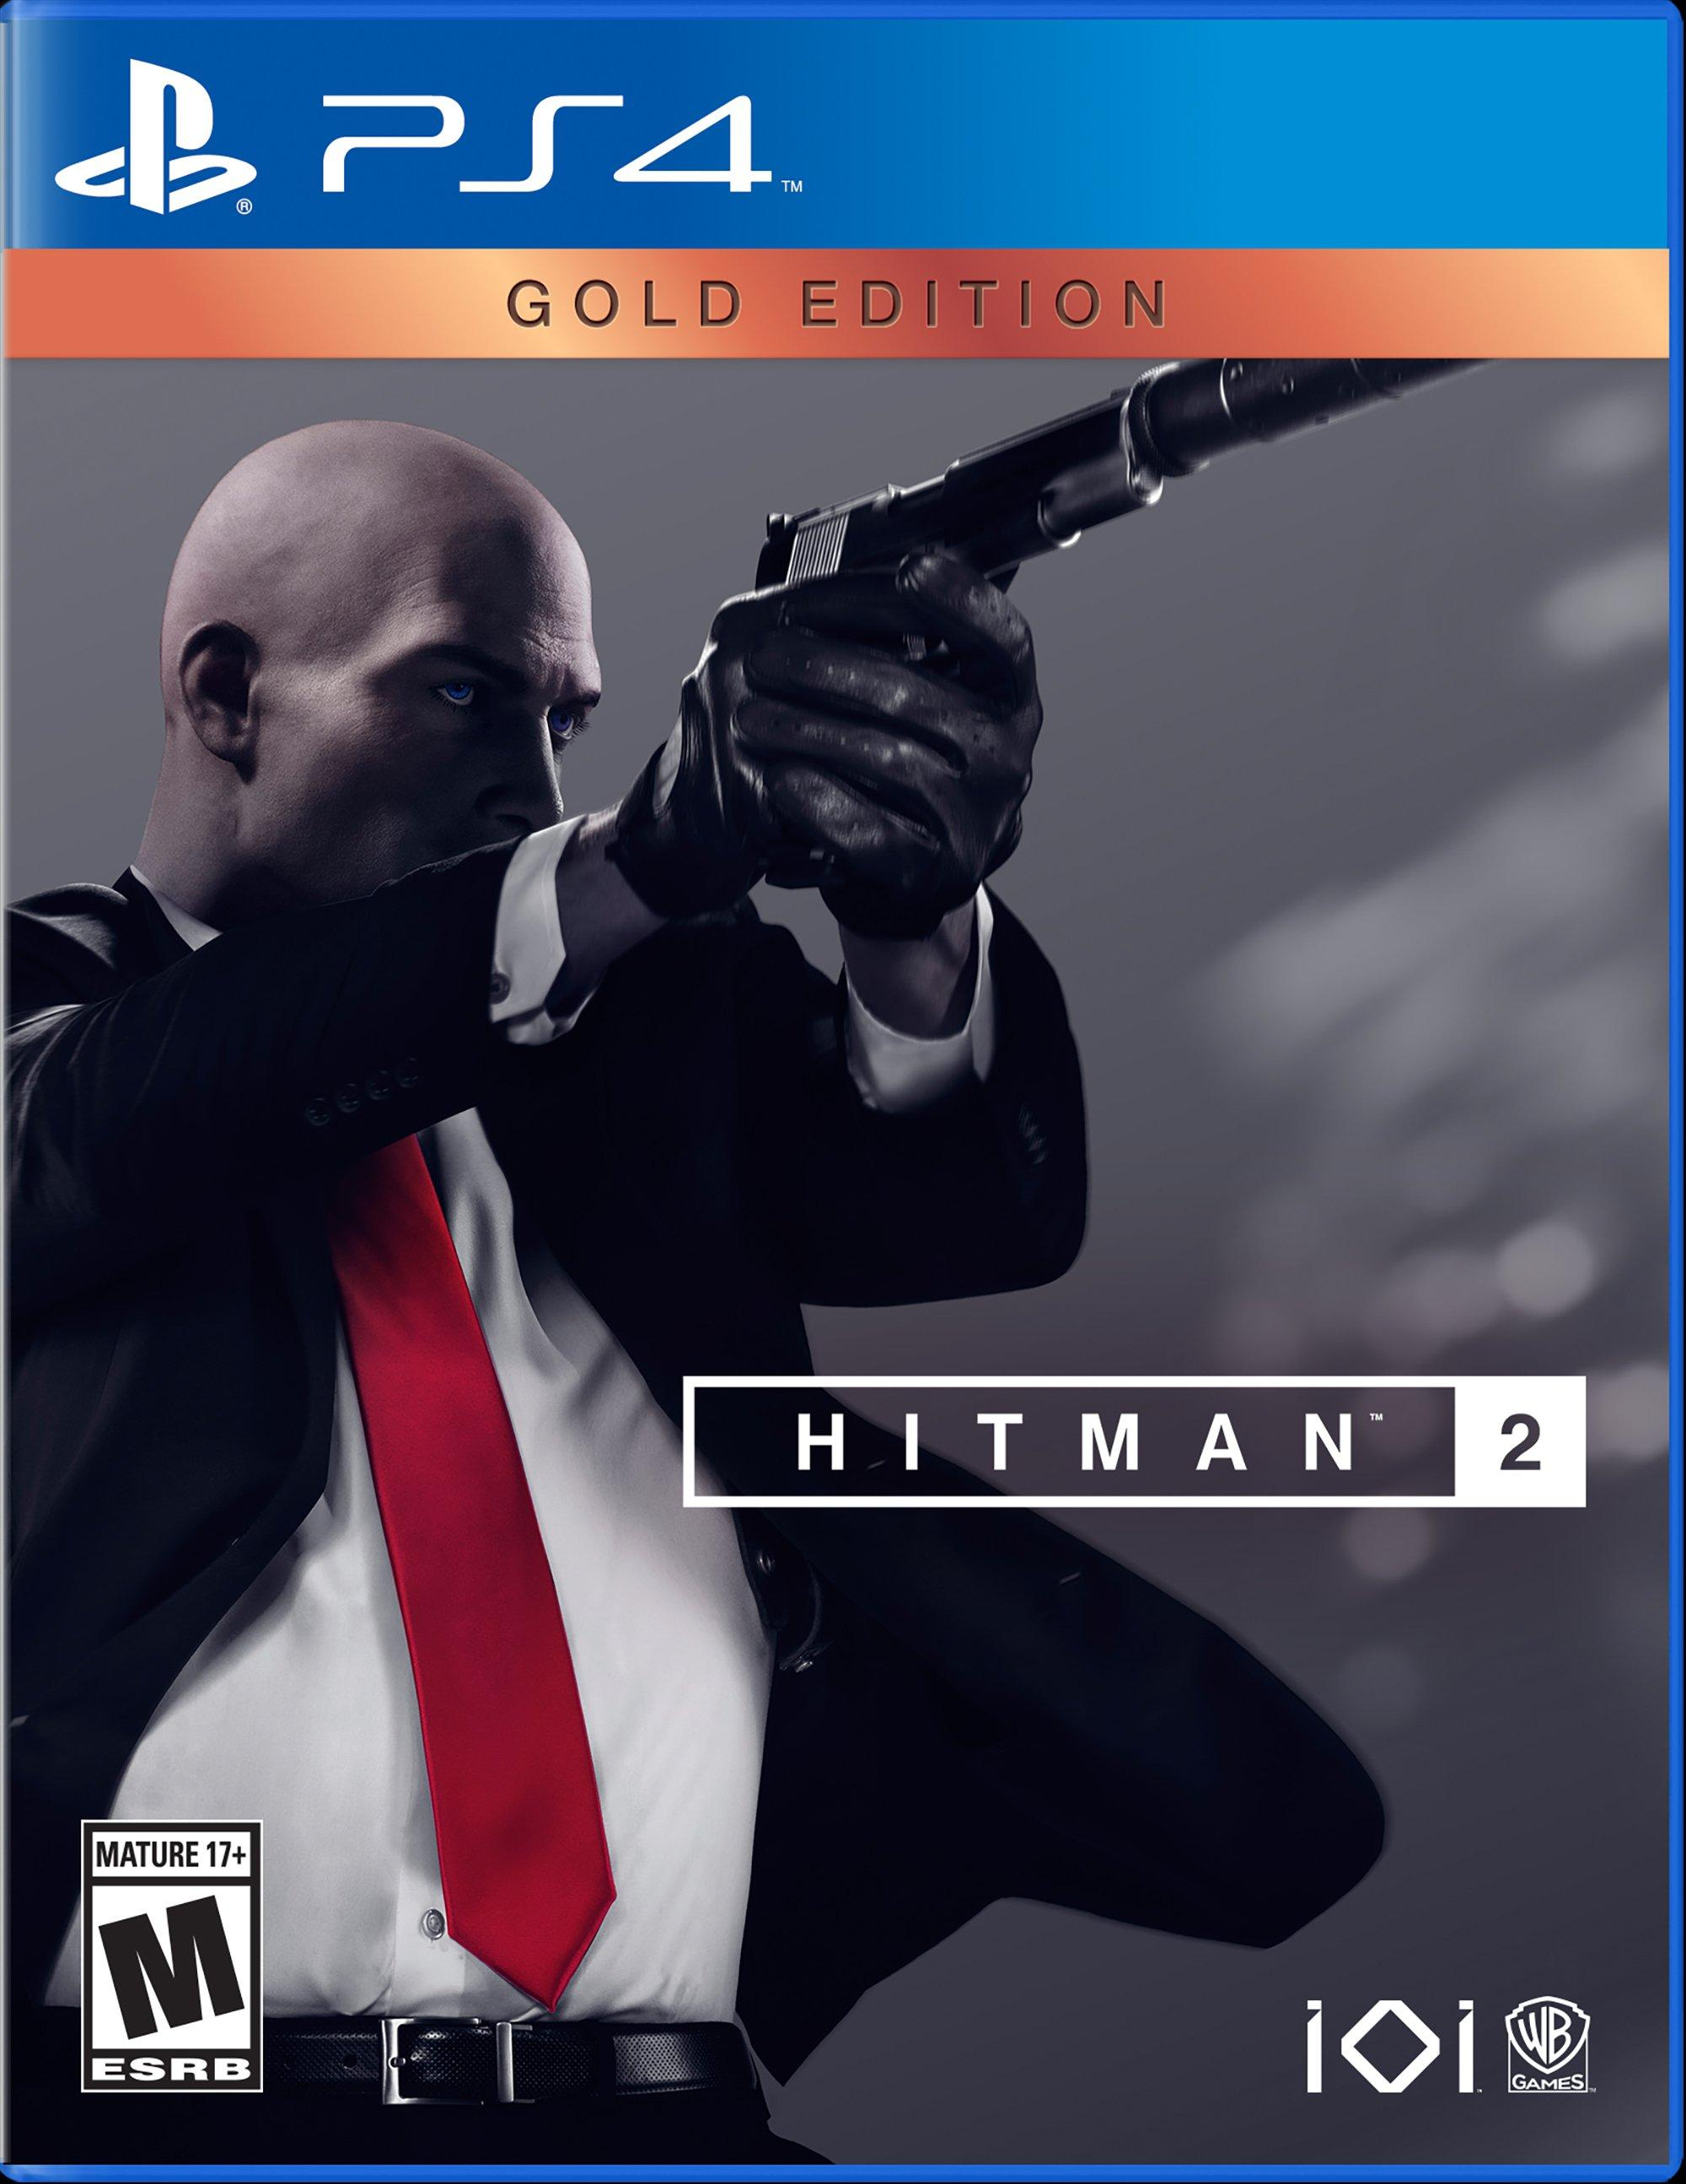 HITMAN 2 Gold Edition | PlayStation 4 | GameStop